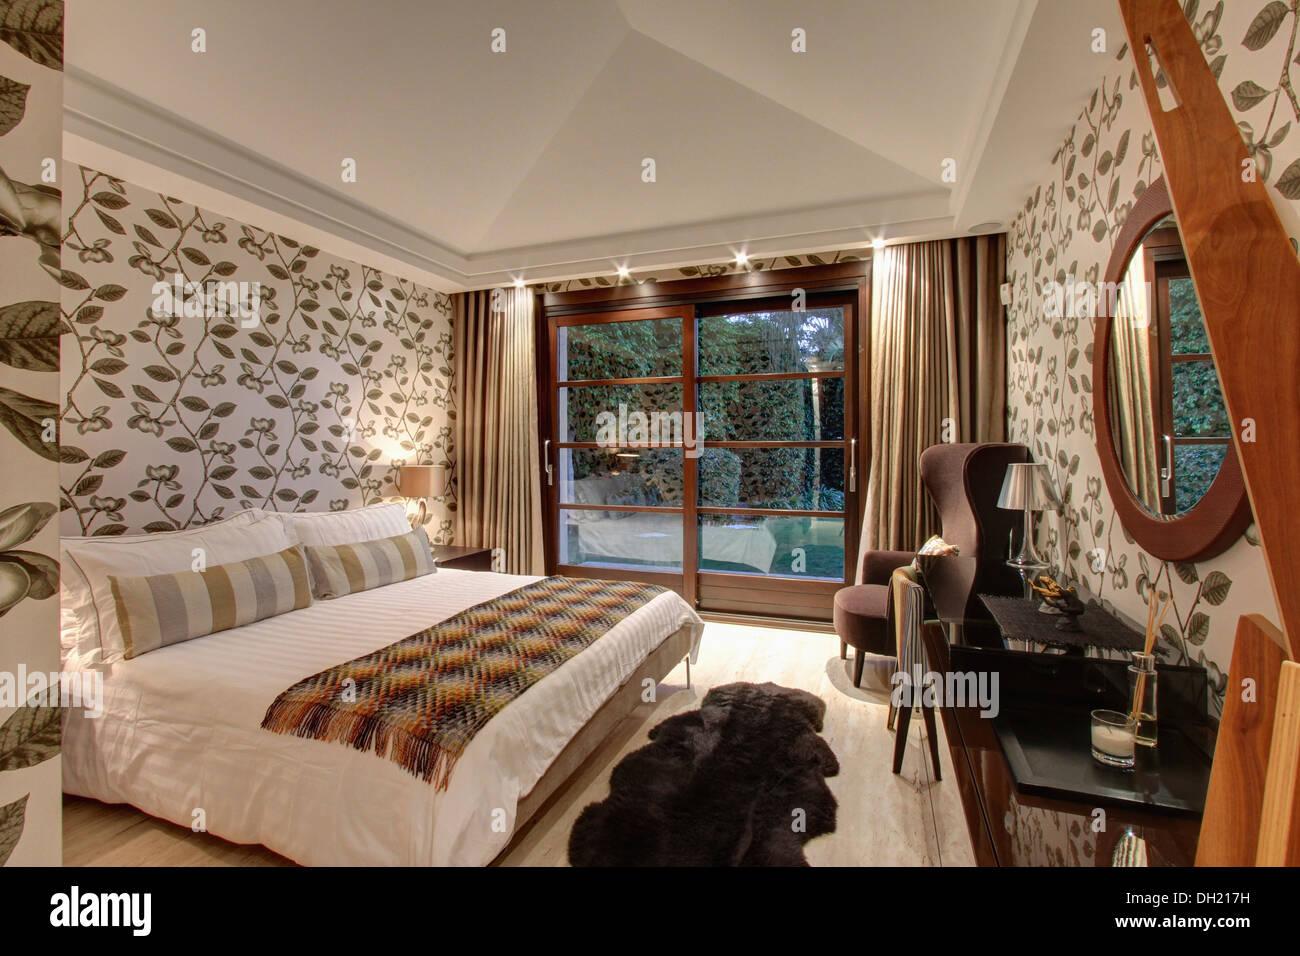 Spanish Bedroom Furniture Furniture Rugs Lighting Stock Photos Furniture Rugs Lighting